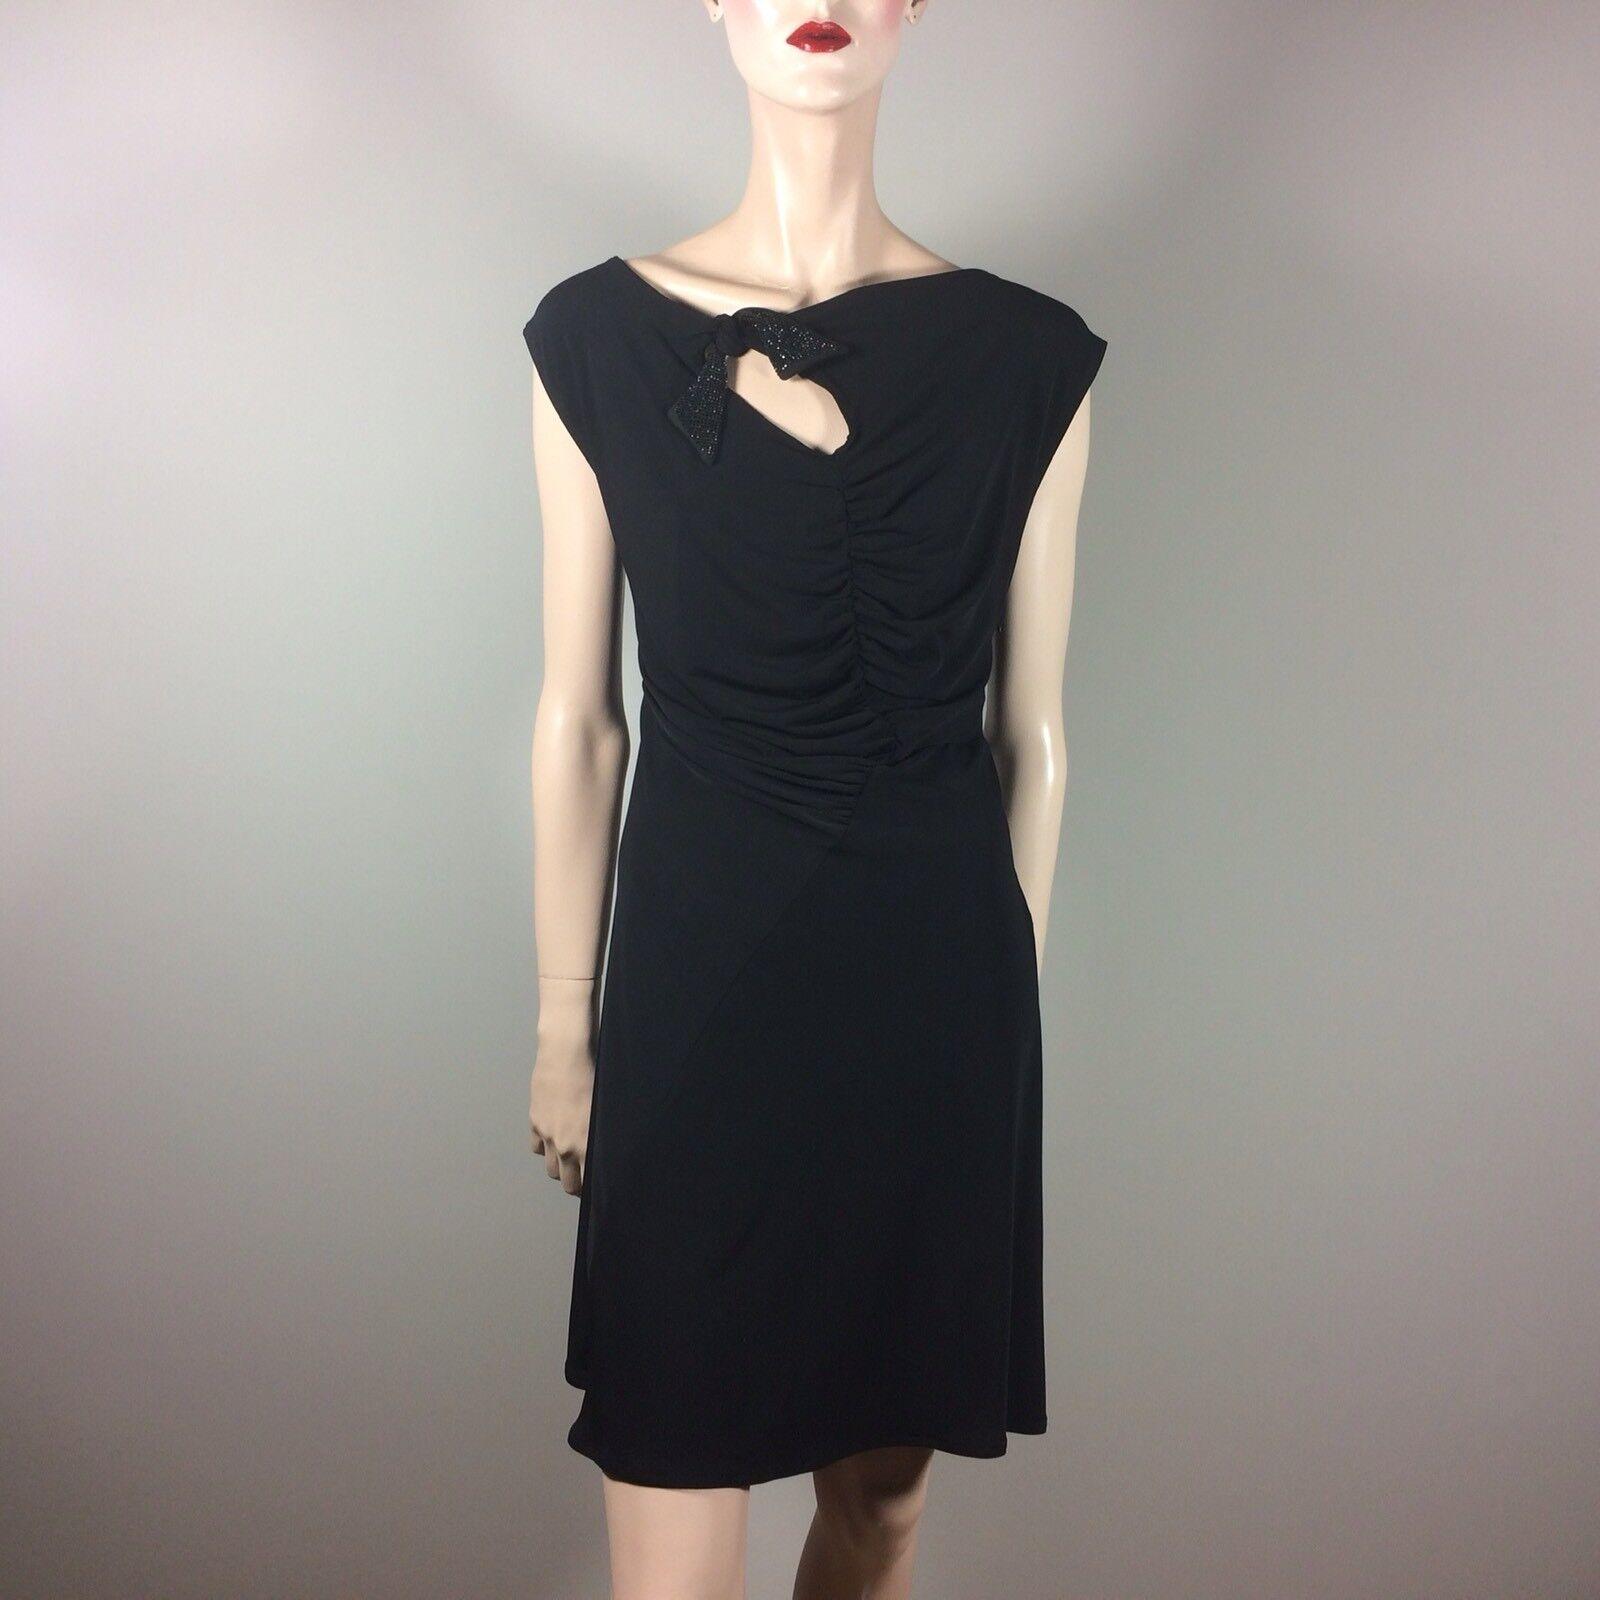 AMOR & PSYCHE Damen Kleid XL L 42 40 Schwarz Kurz Strass Schleife Glamour Style